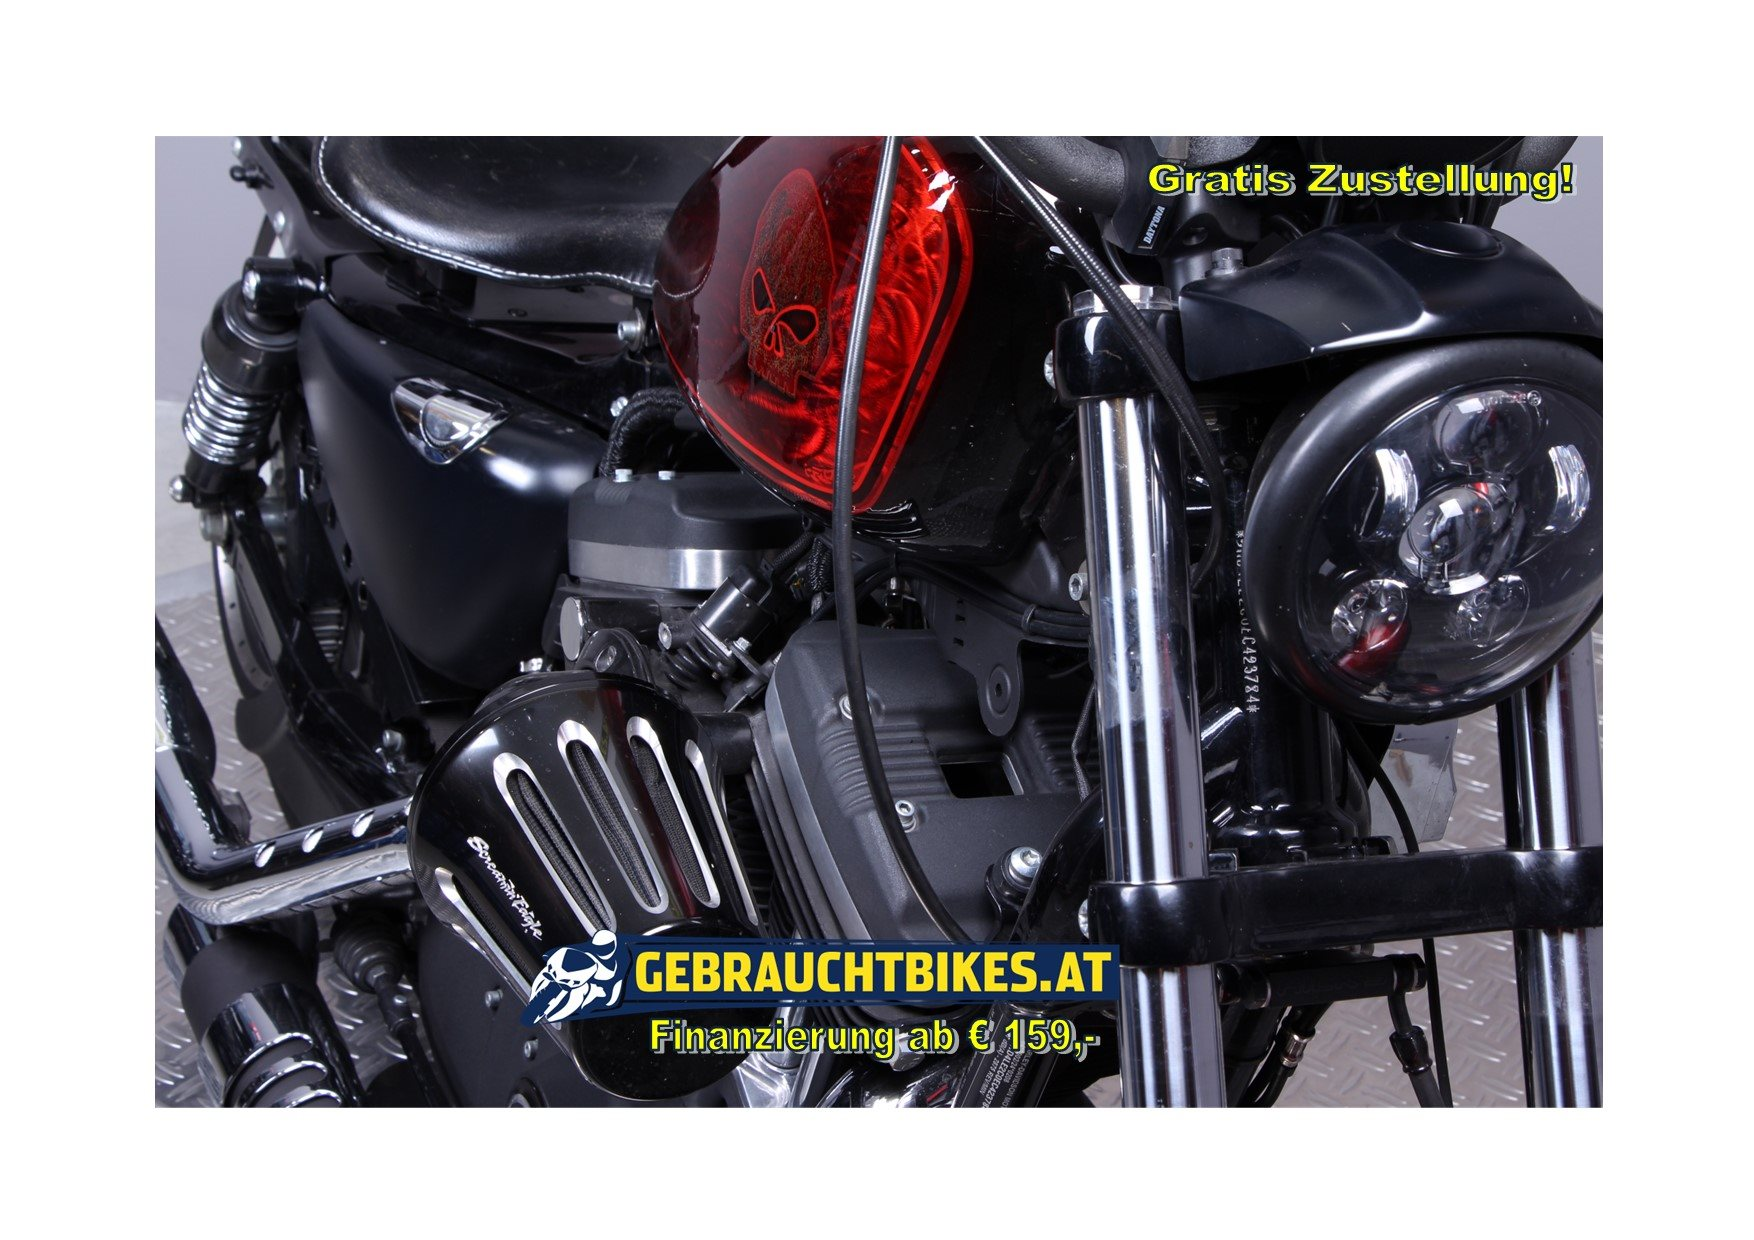 Harley-Davidson Sportster XL 883 Classic Motorrad, gebraucht